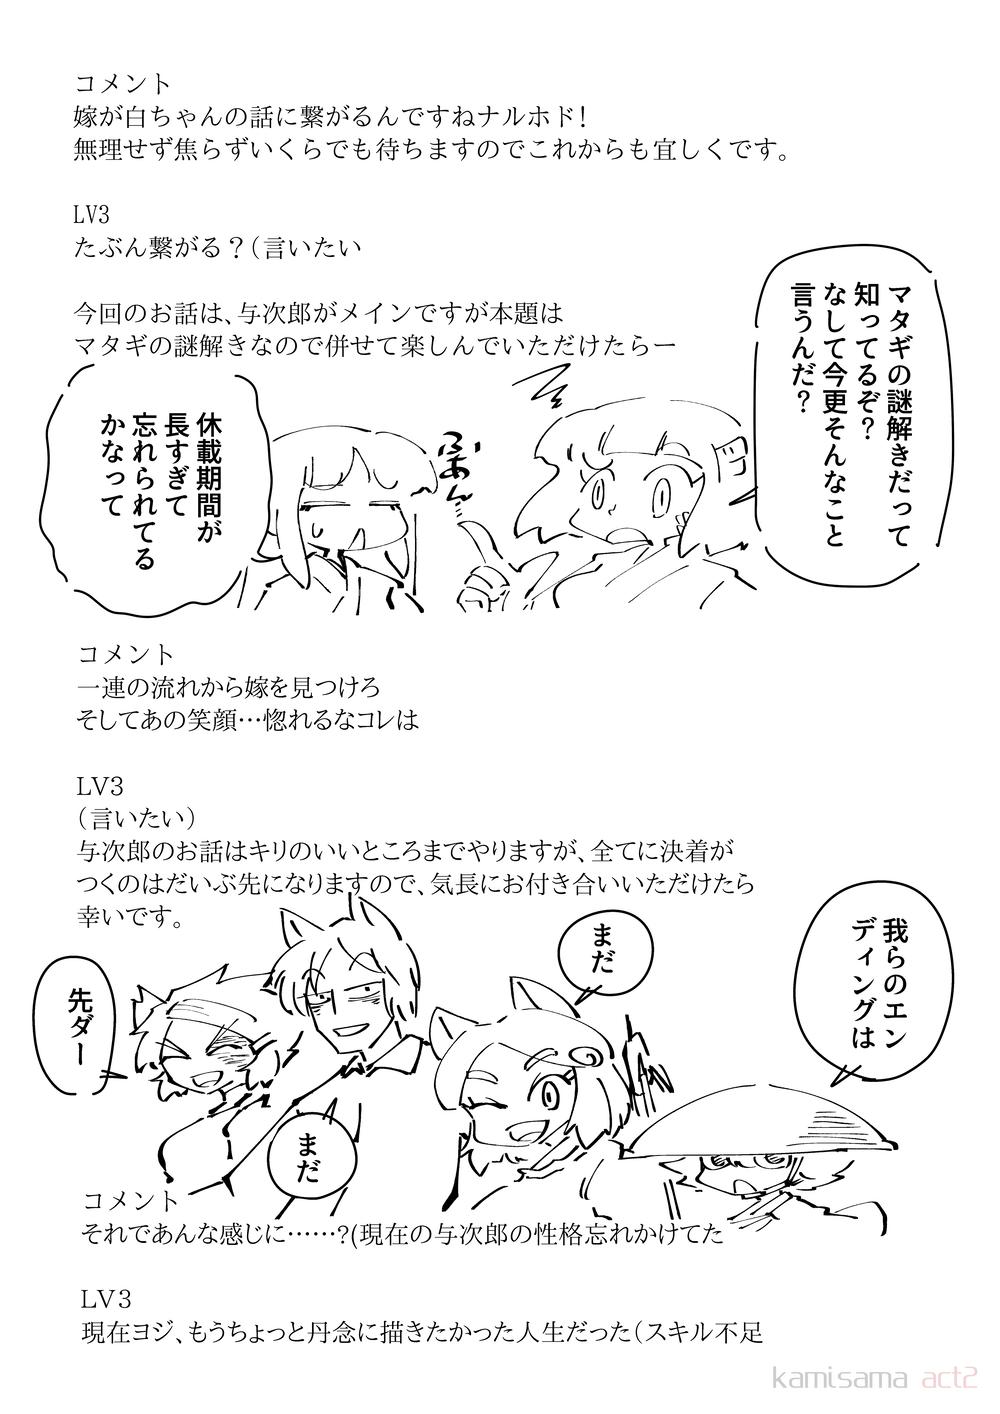 2life114_022.png